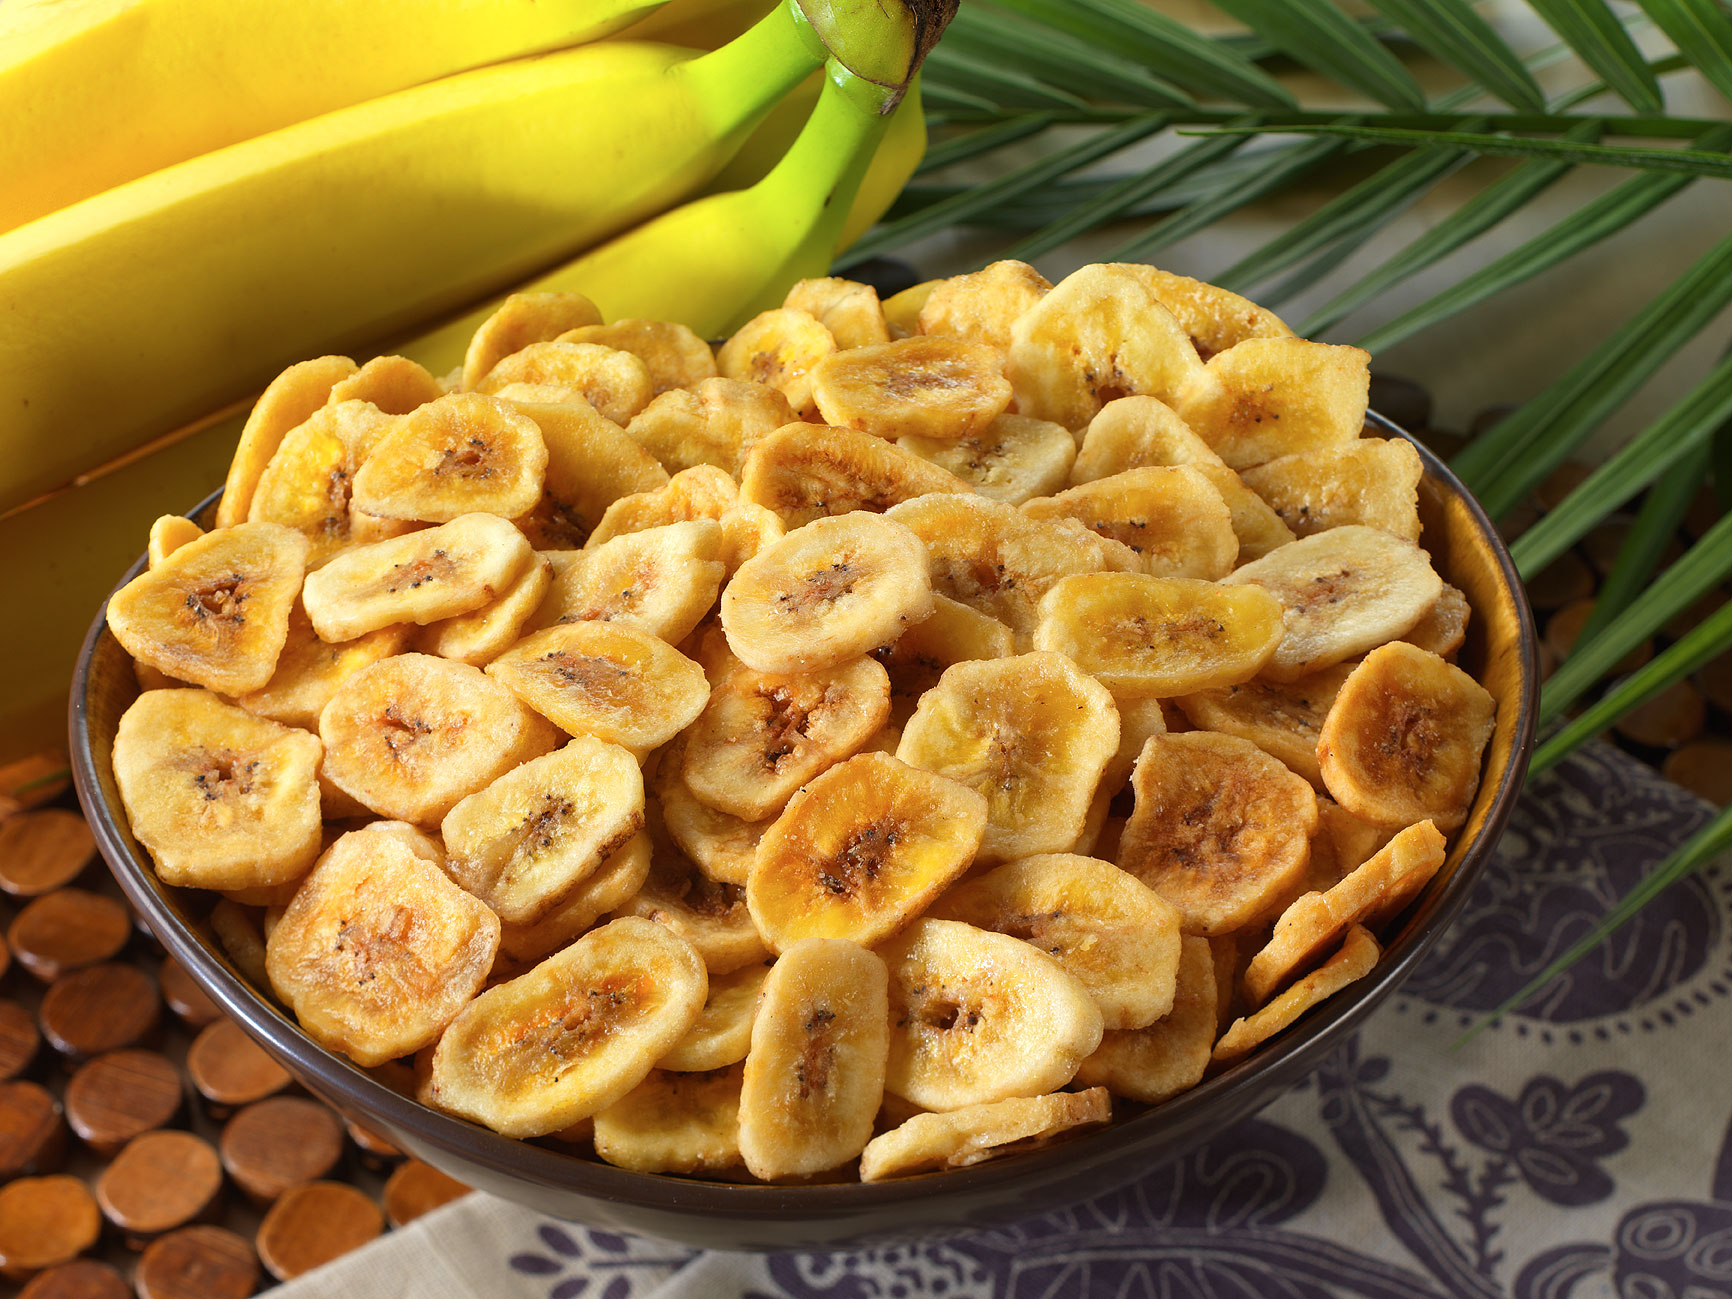 Photo taken from valebio.com